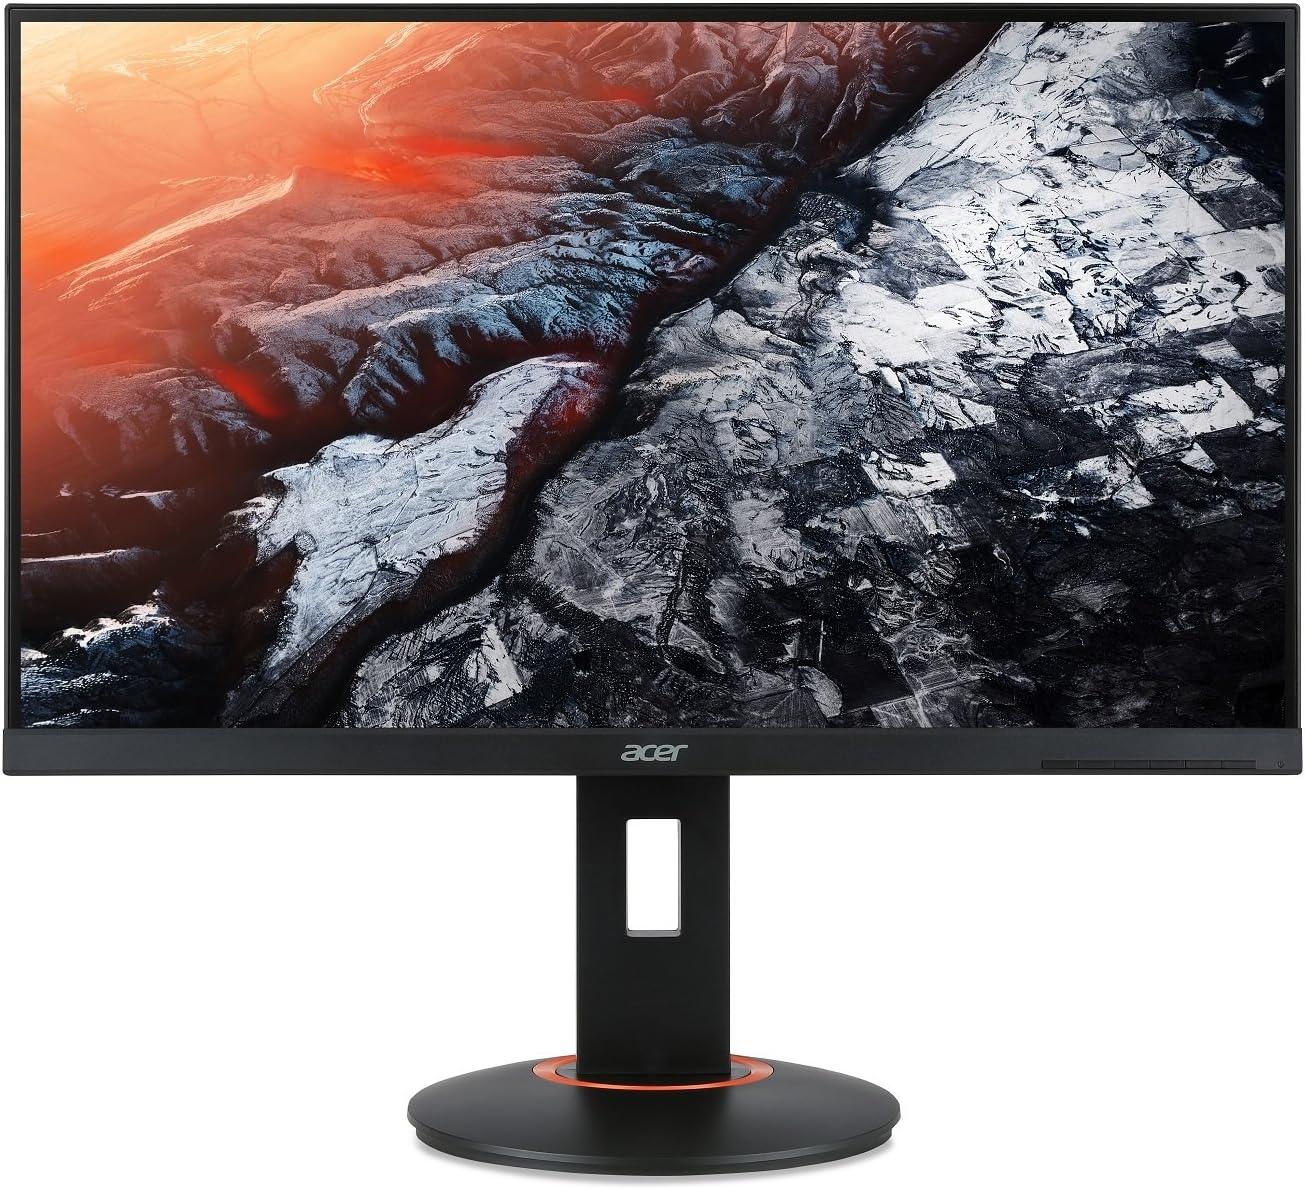 "Acer XF270HU Cbmiiprx 27"" WQHD (2560 x 1440) TN AMD FreeSync Gaming Monitor, 144Hz Refresh Rate, 1ms, (Display Port 1.2 & 2 x HDMI Ports),Black"